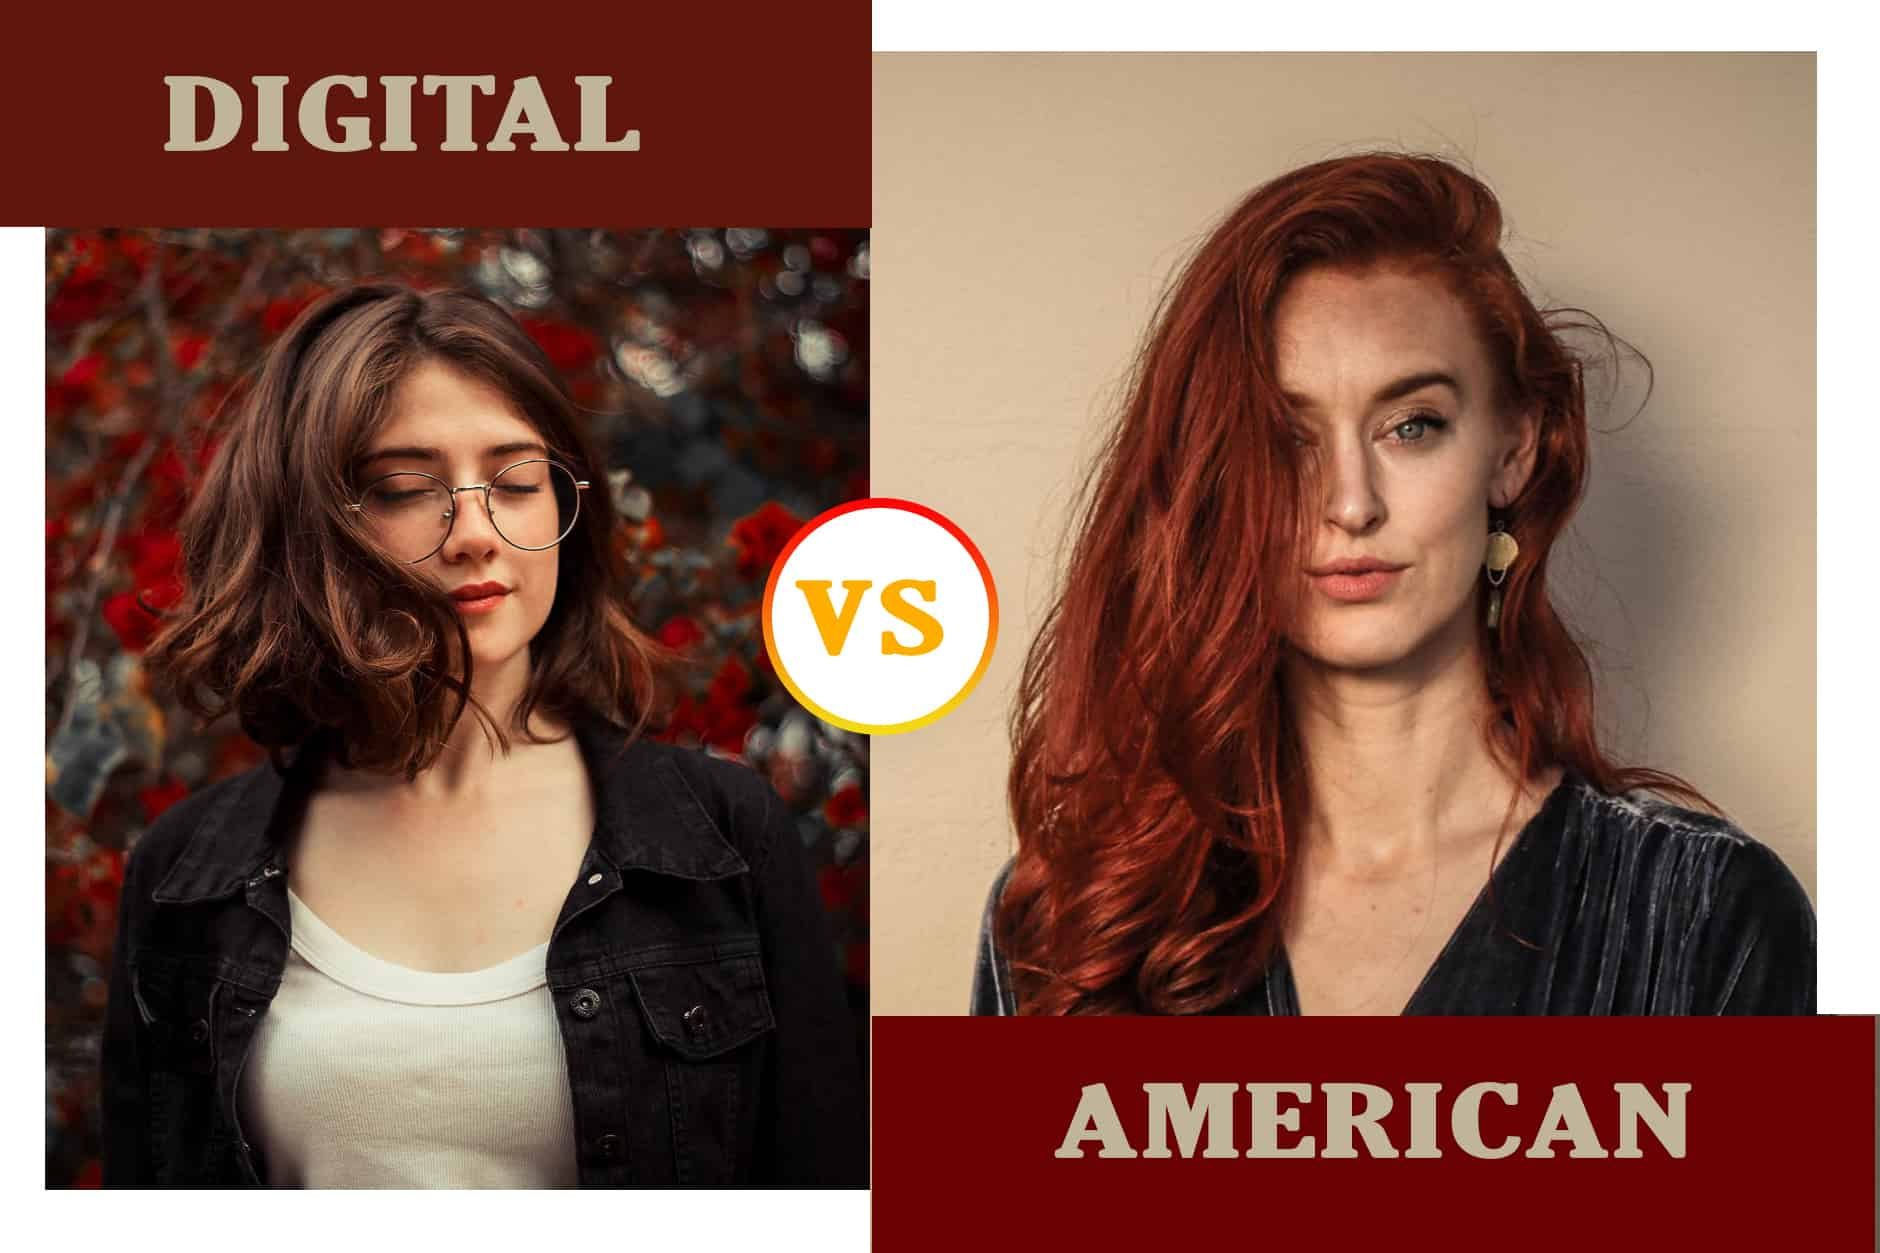 Digital perm vs American wave perm